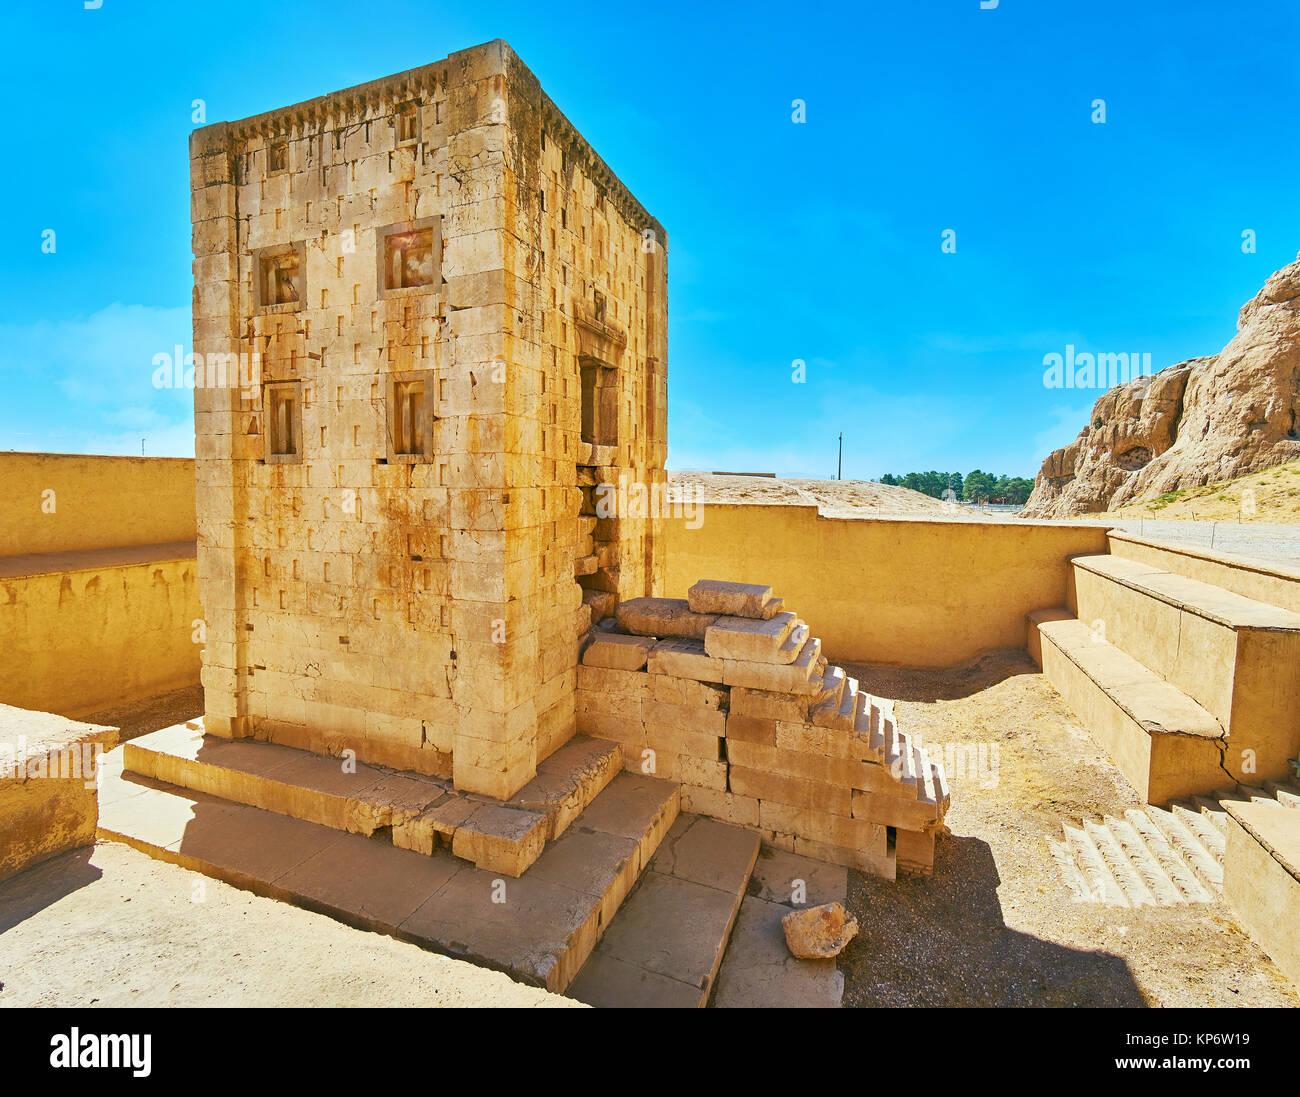 Ka'ba-ye Zartosht is the ancient tower, built of limestone on territory of Naqsh-e Rustam Necropolis, Iran. - Stock Image